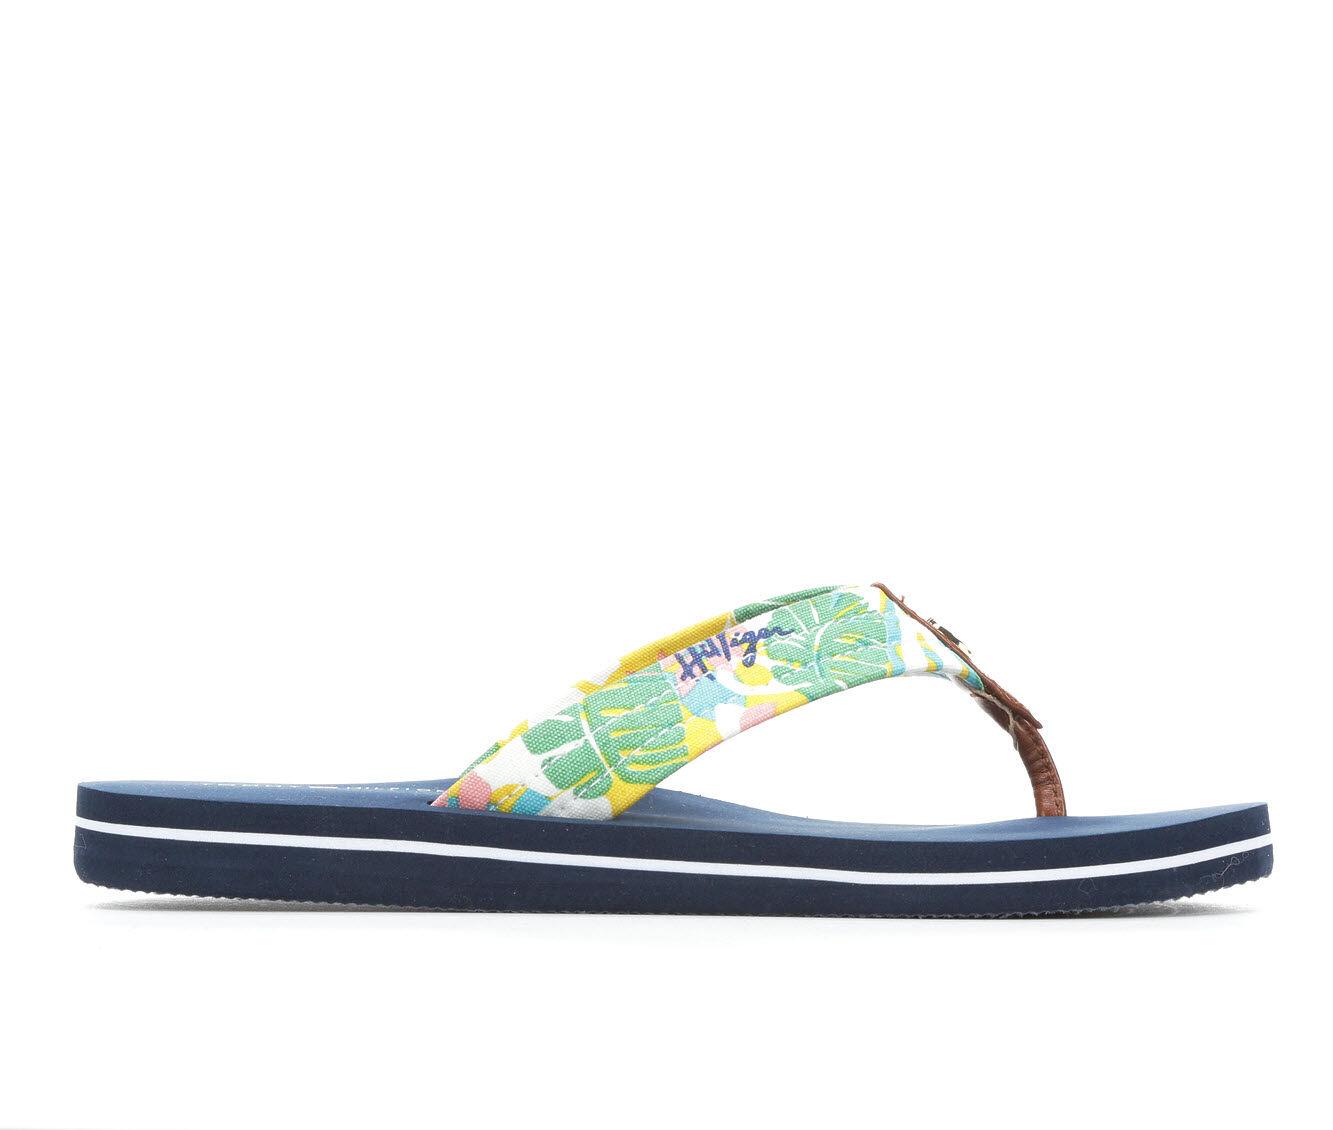 discount Women's Tommy Hilfiger Cinta Flip-Flops Yellow Multi